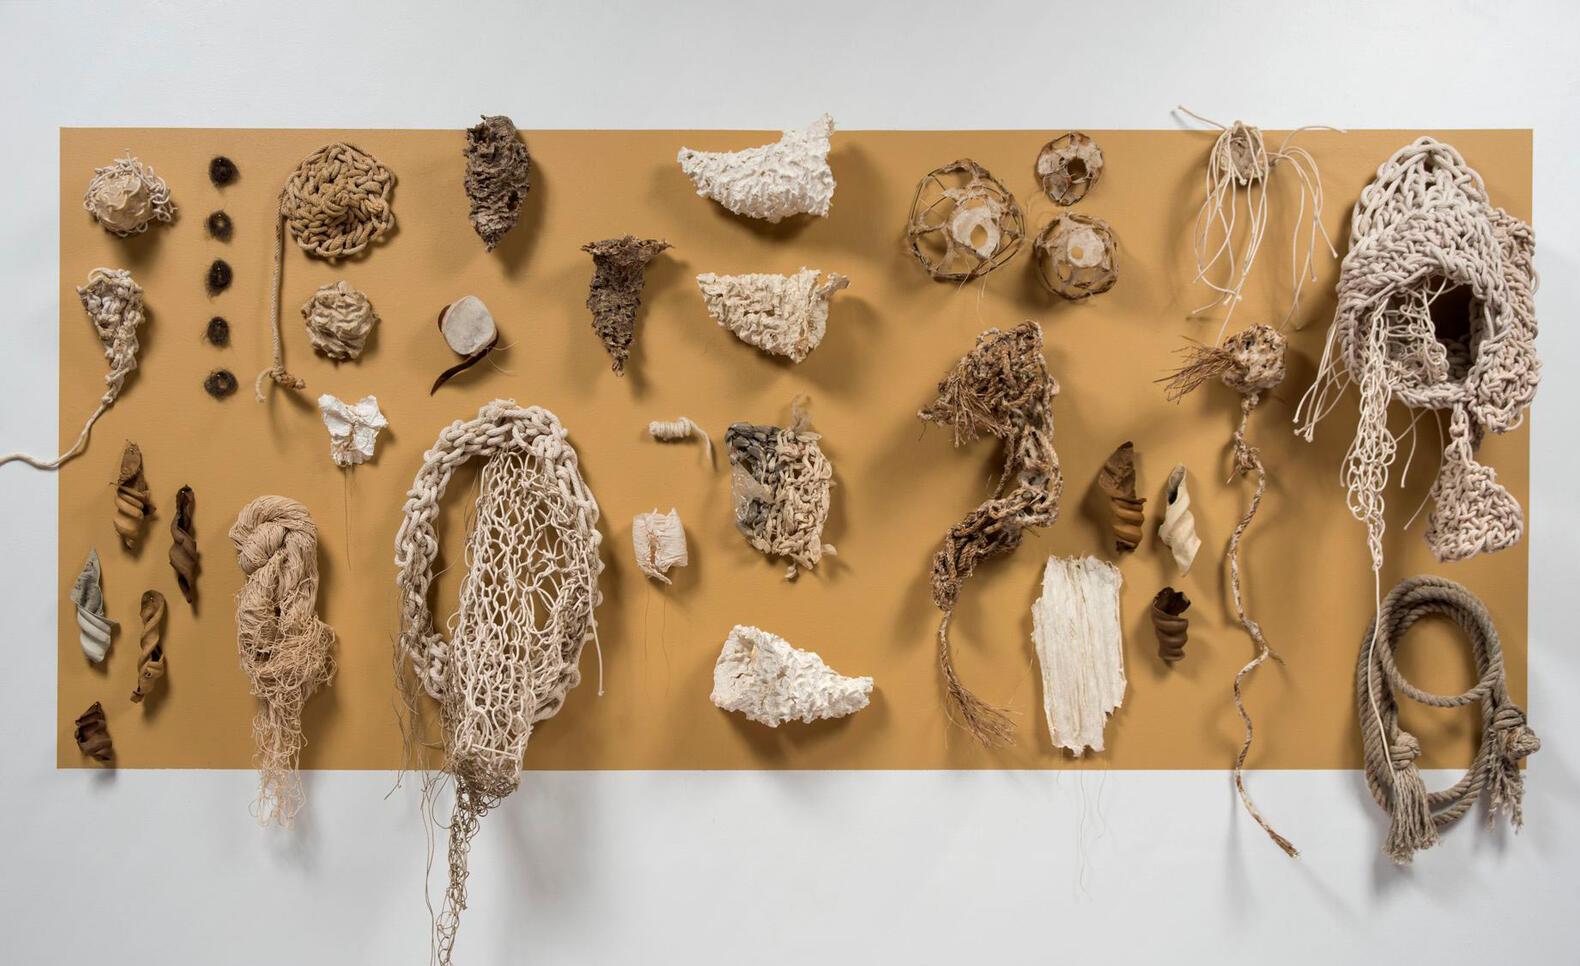 Circuits (Wall installation), 2017-18, abaca paper, leather, Karakul wool, sisal, cotton twine. Photo: Jerry Mathiason ; Marjorie Fedyszyn